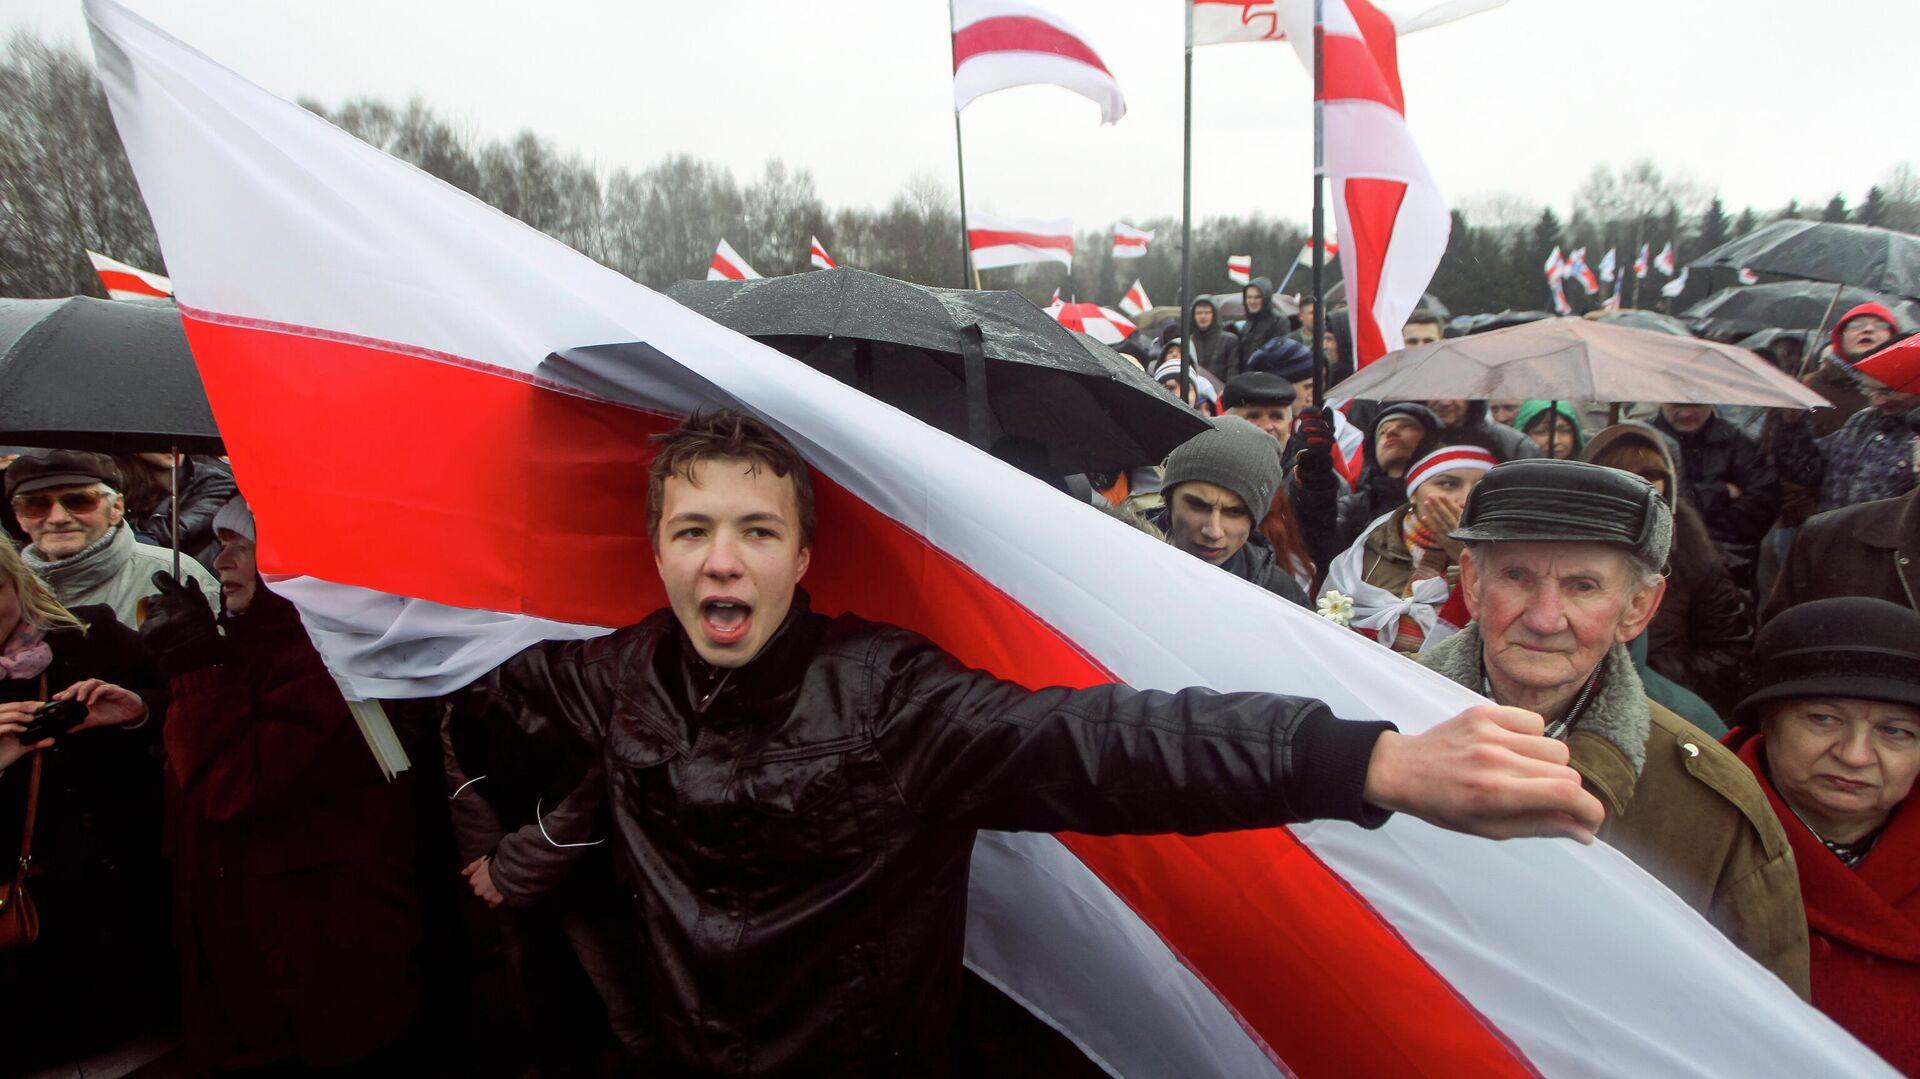 Активист Роман Протасевич во время акции протеста в Минске - РИА Новости, 1920, 02.06.2021